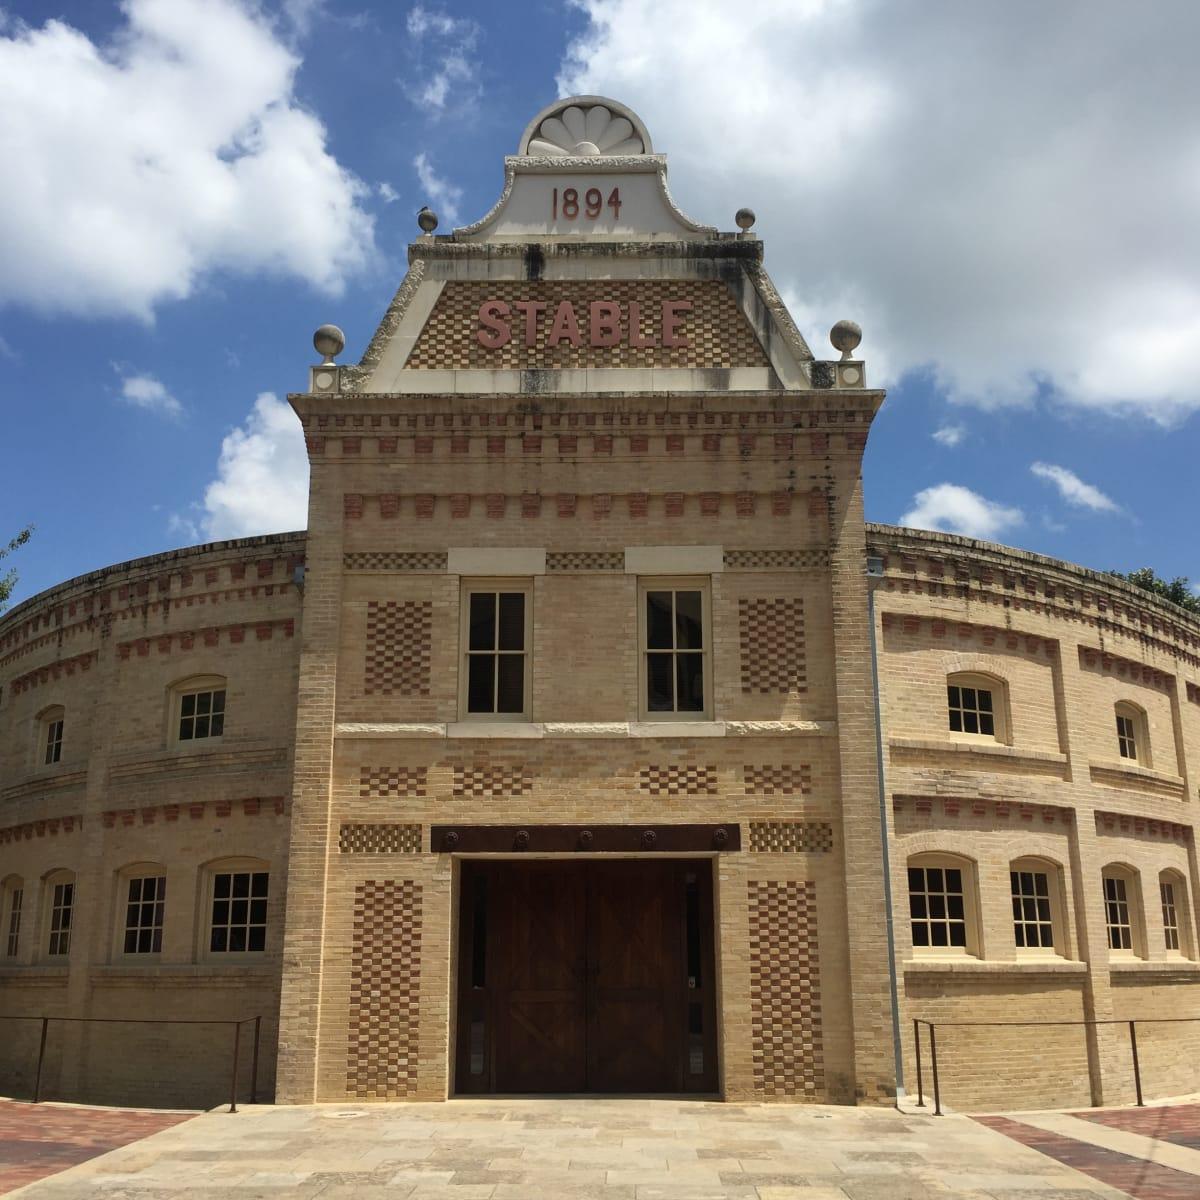 The Stable in San Antonio, Texas